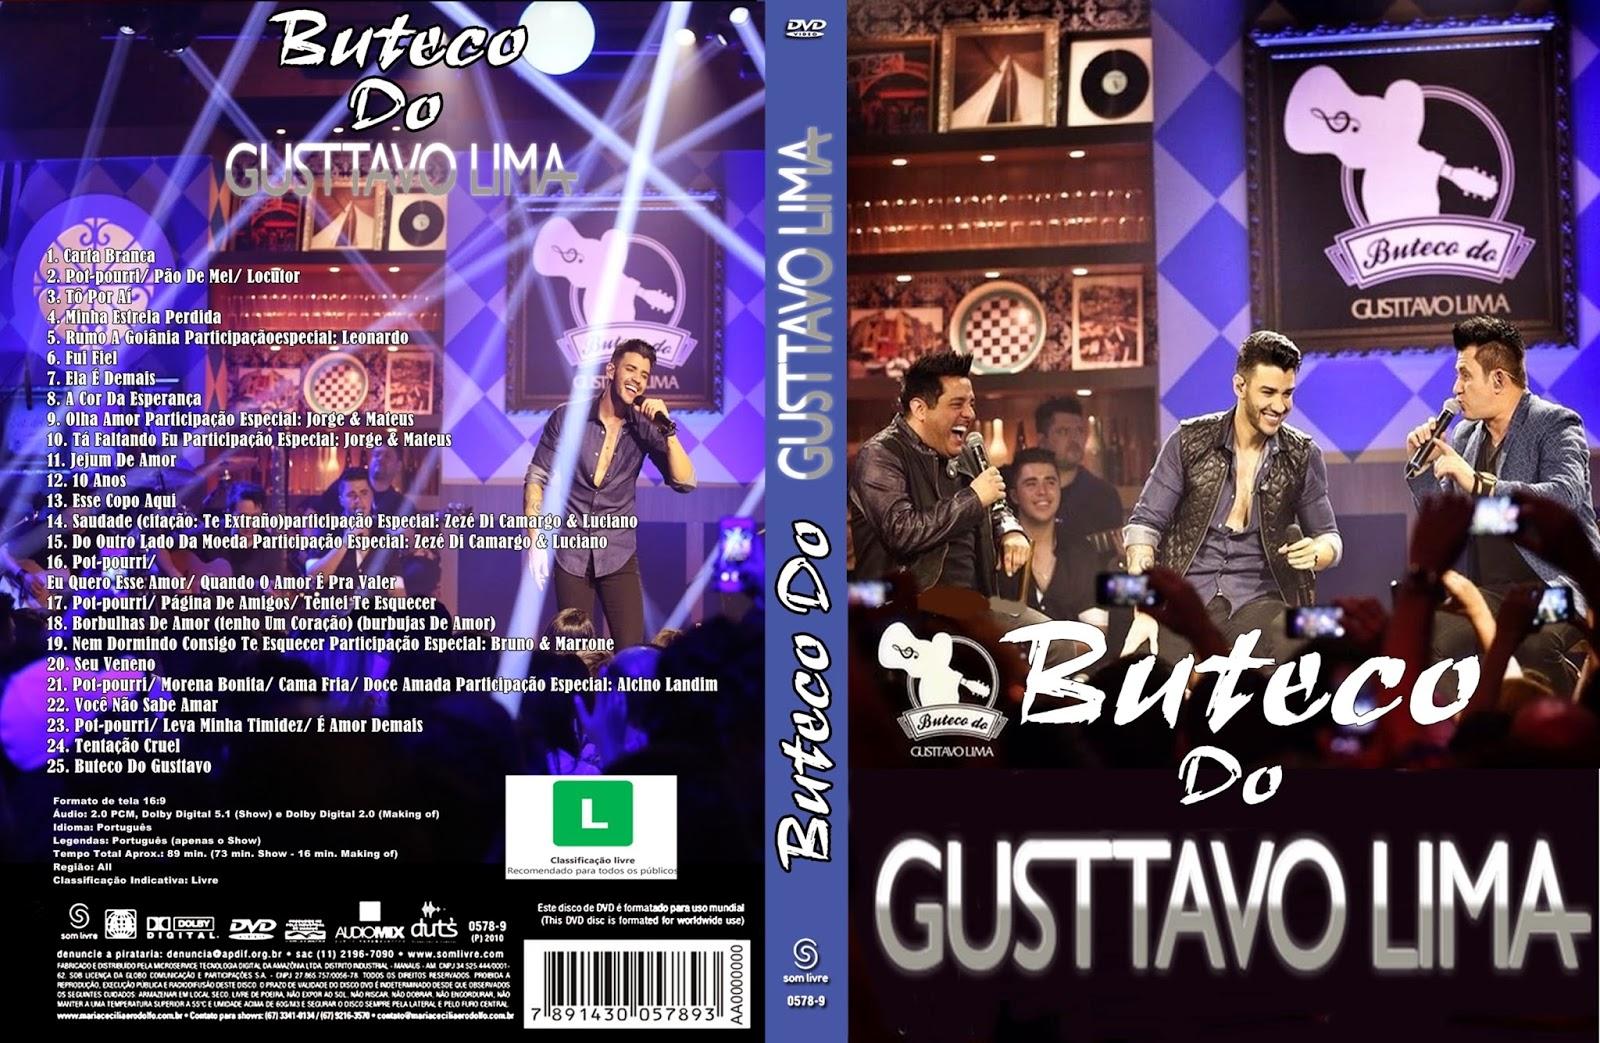 Baixar Gusttavo Lima Buteco do Gusttavo Lima DVD-R Gusttavo 2BLima 2B  2BButeco 2B  2BAo 2BVivo